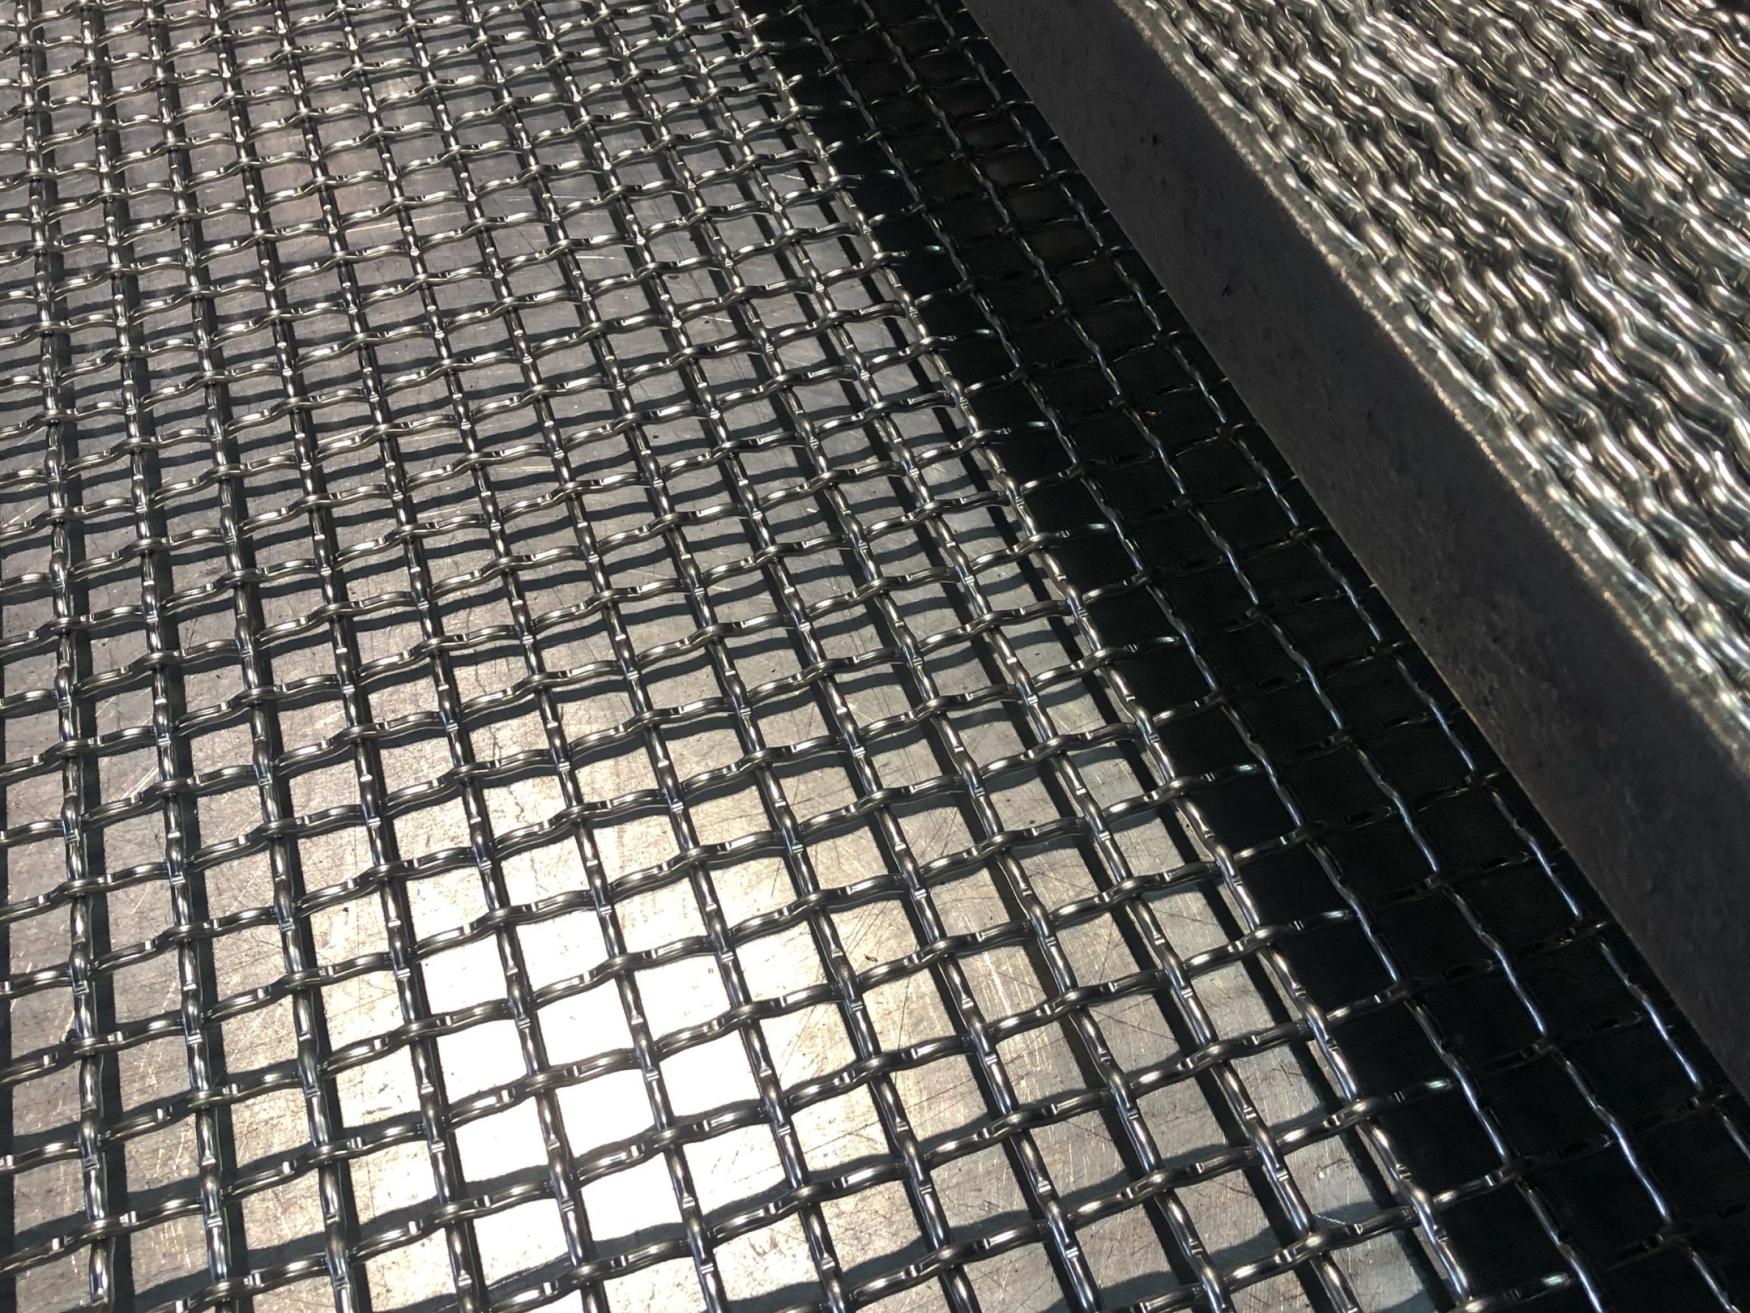 cf-wire mesh weaving-FINAL-4